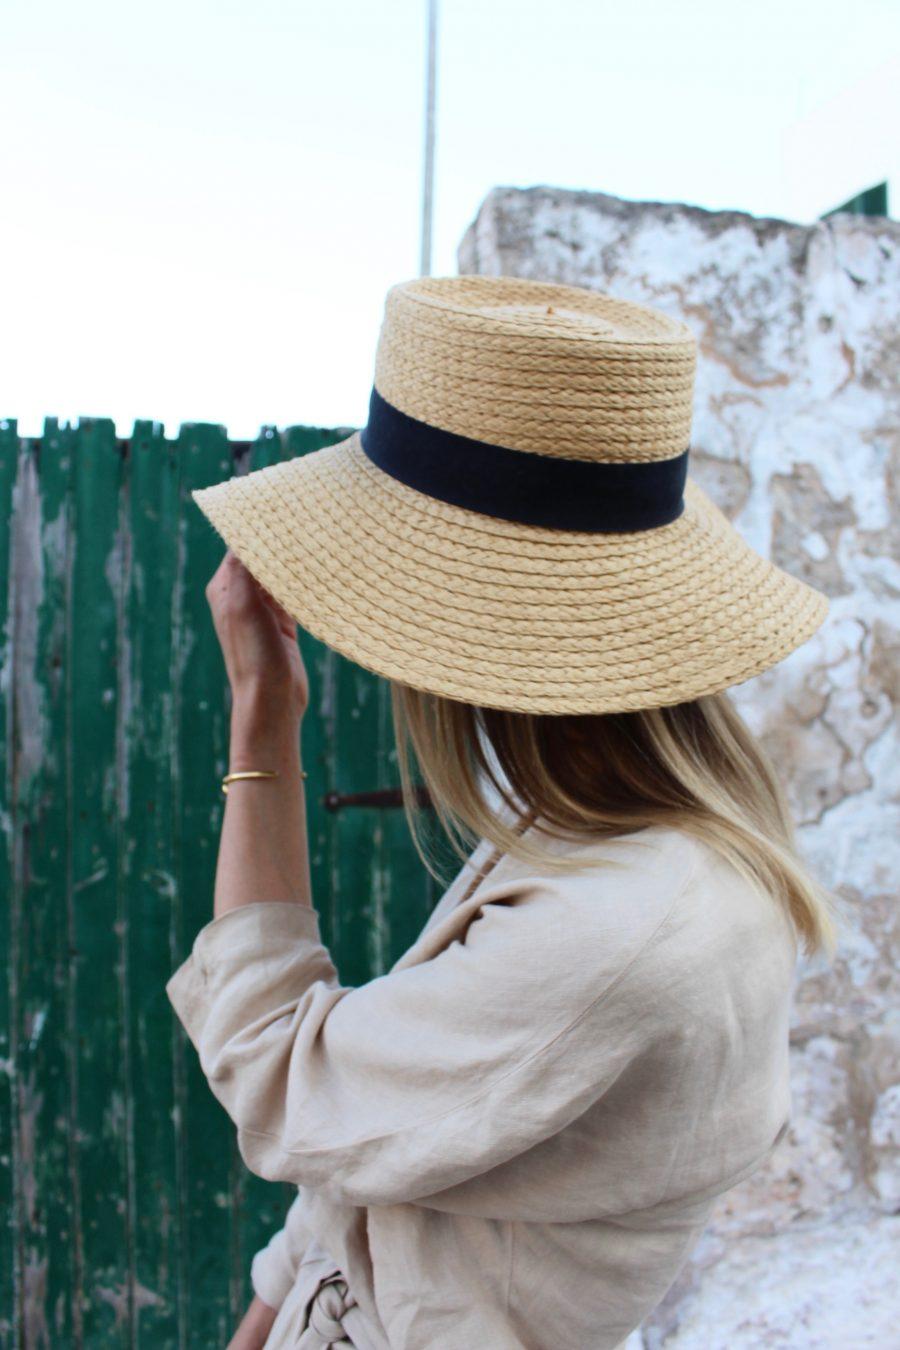 H&M trend hat